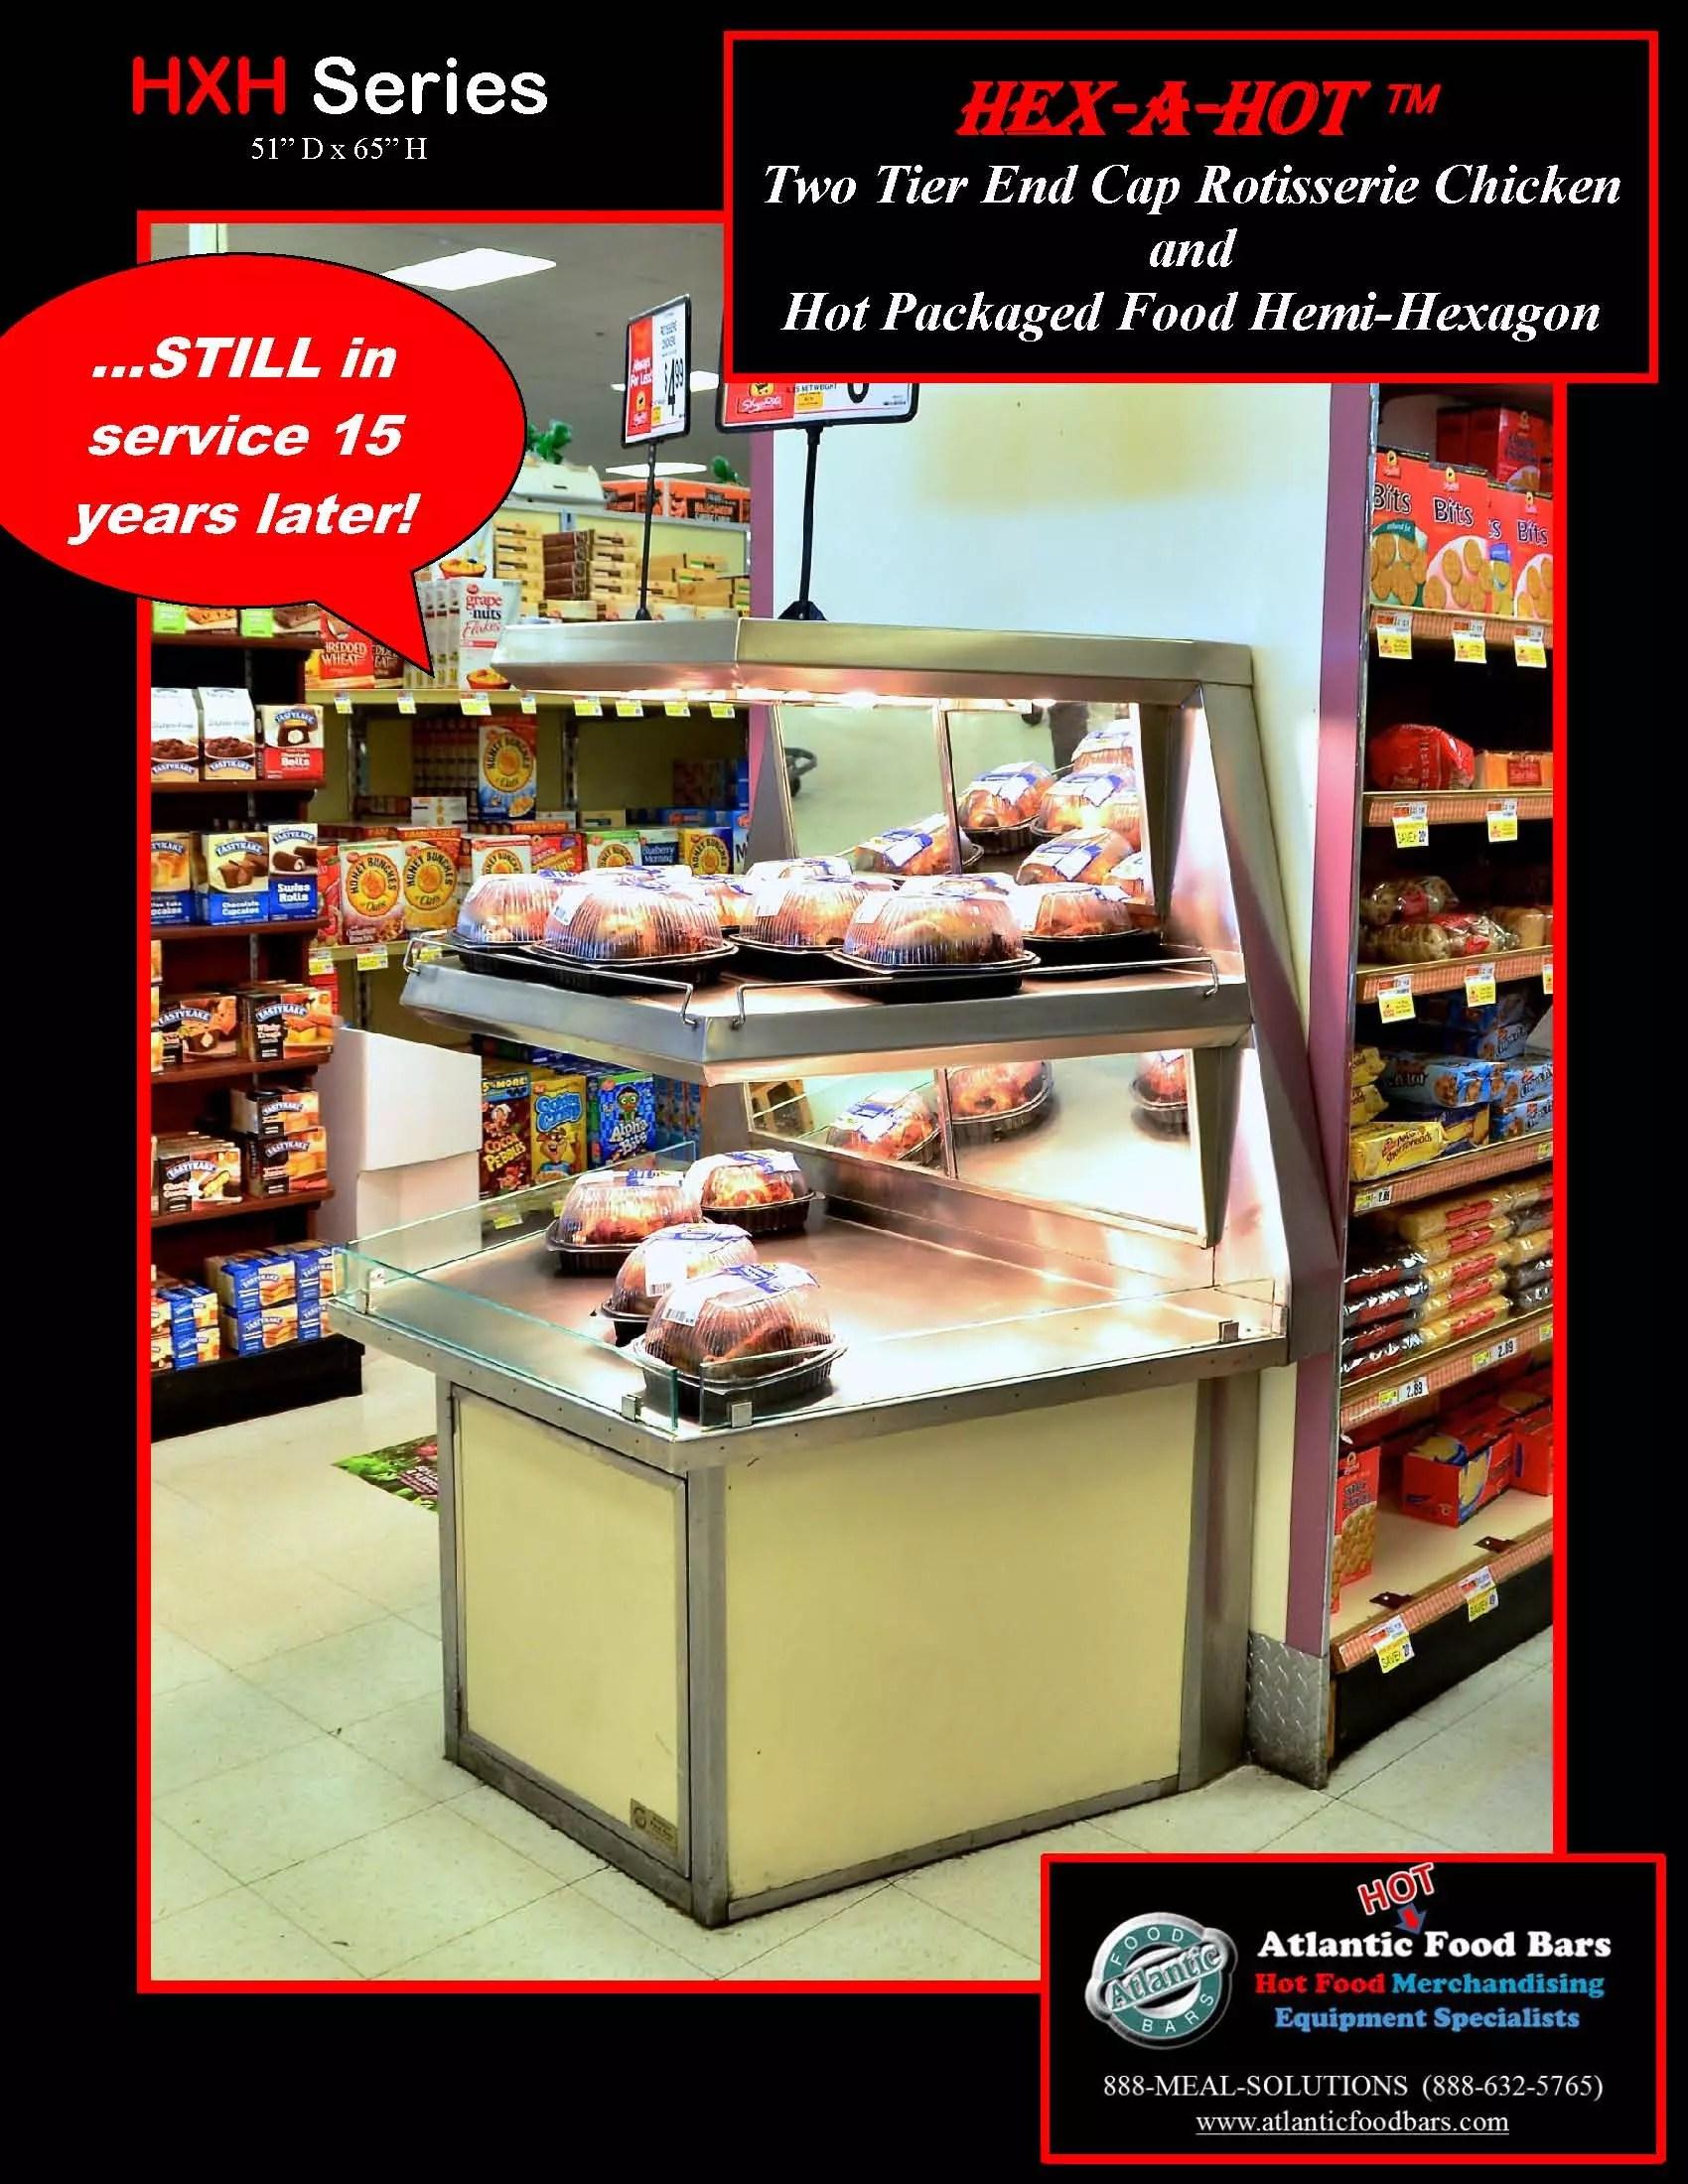 Atlantic Food Bars - The 15-Year Club - HXH Hex-a-Hot Hot Rotisserie Chicken Merchandiser - STILL IN SERVICE!